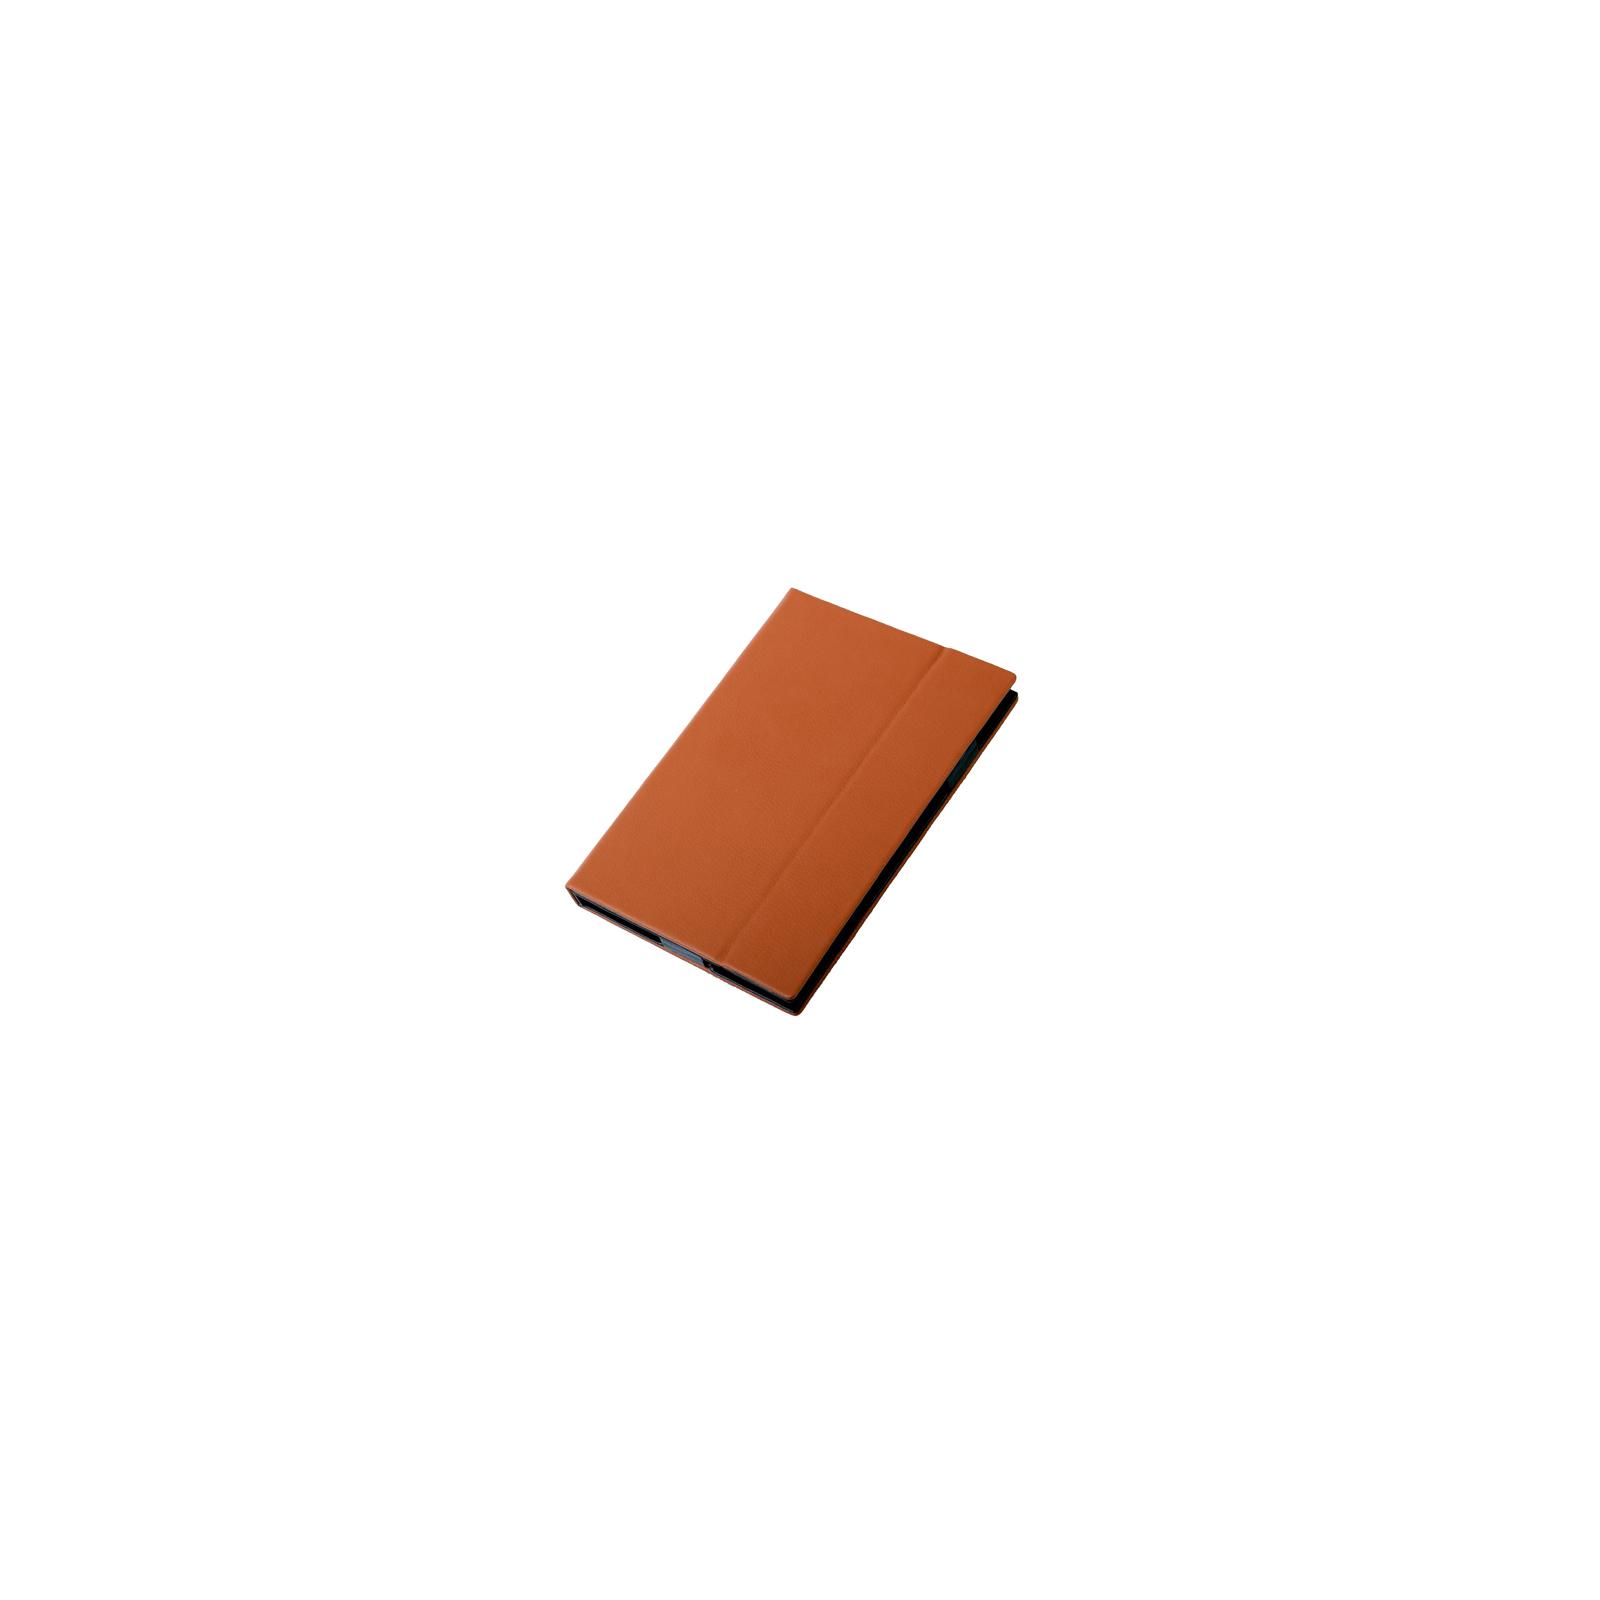 Чехол для планшета Vento 9.7 Desire Matt - brown